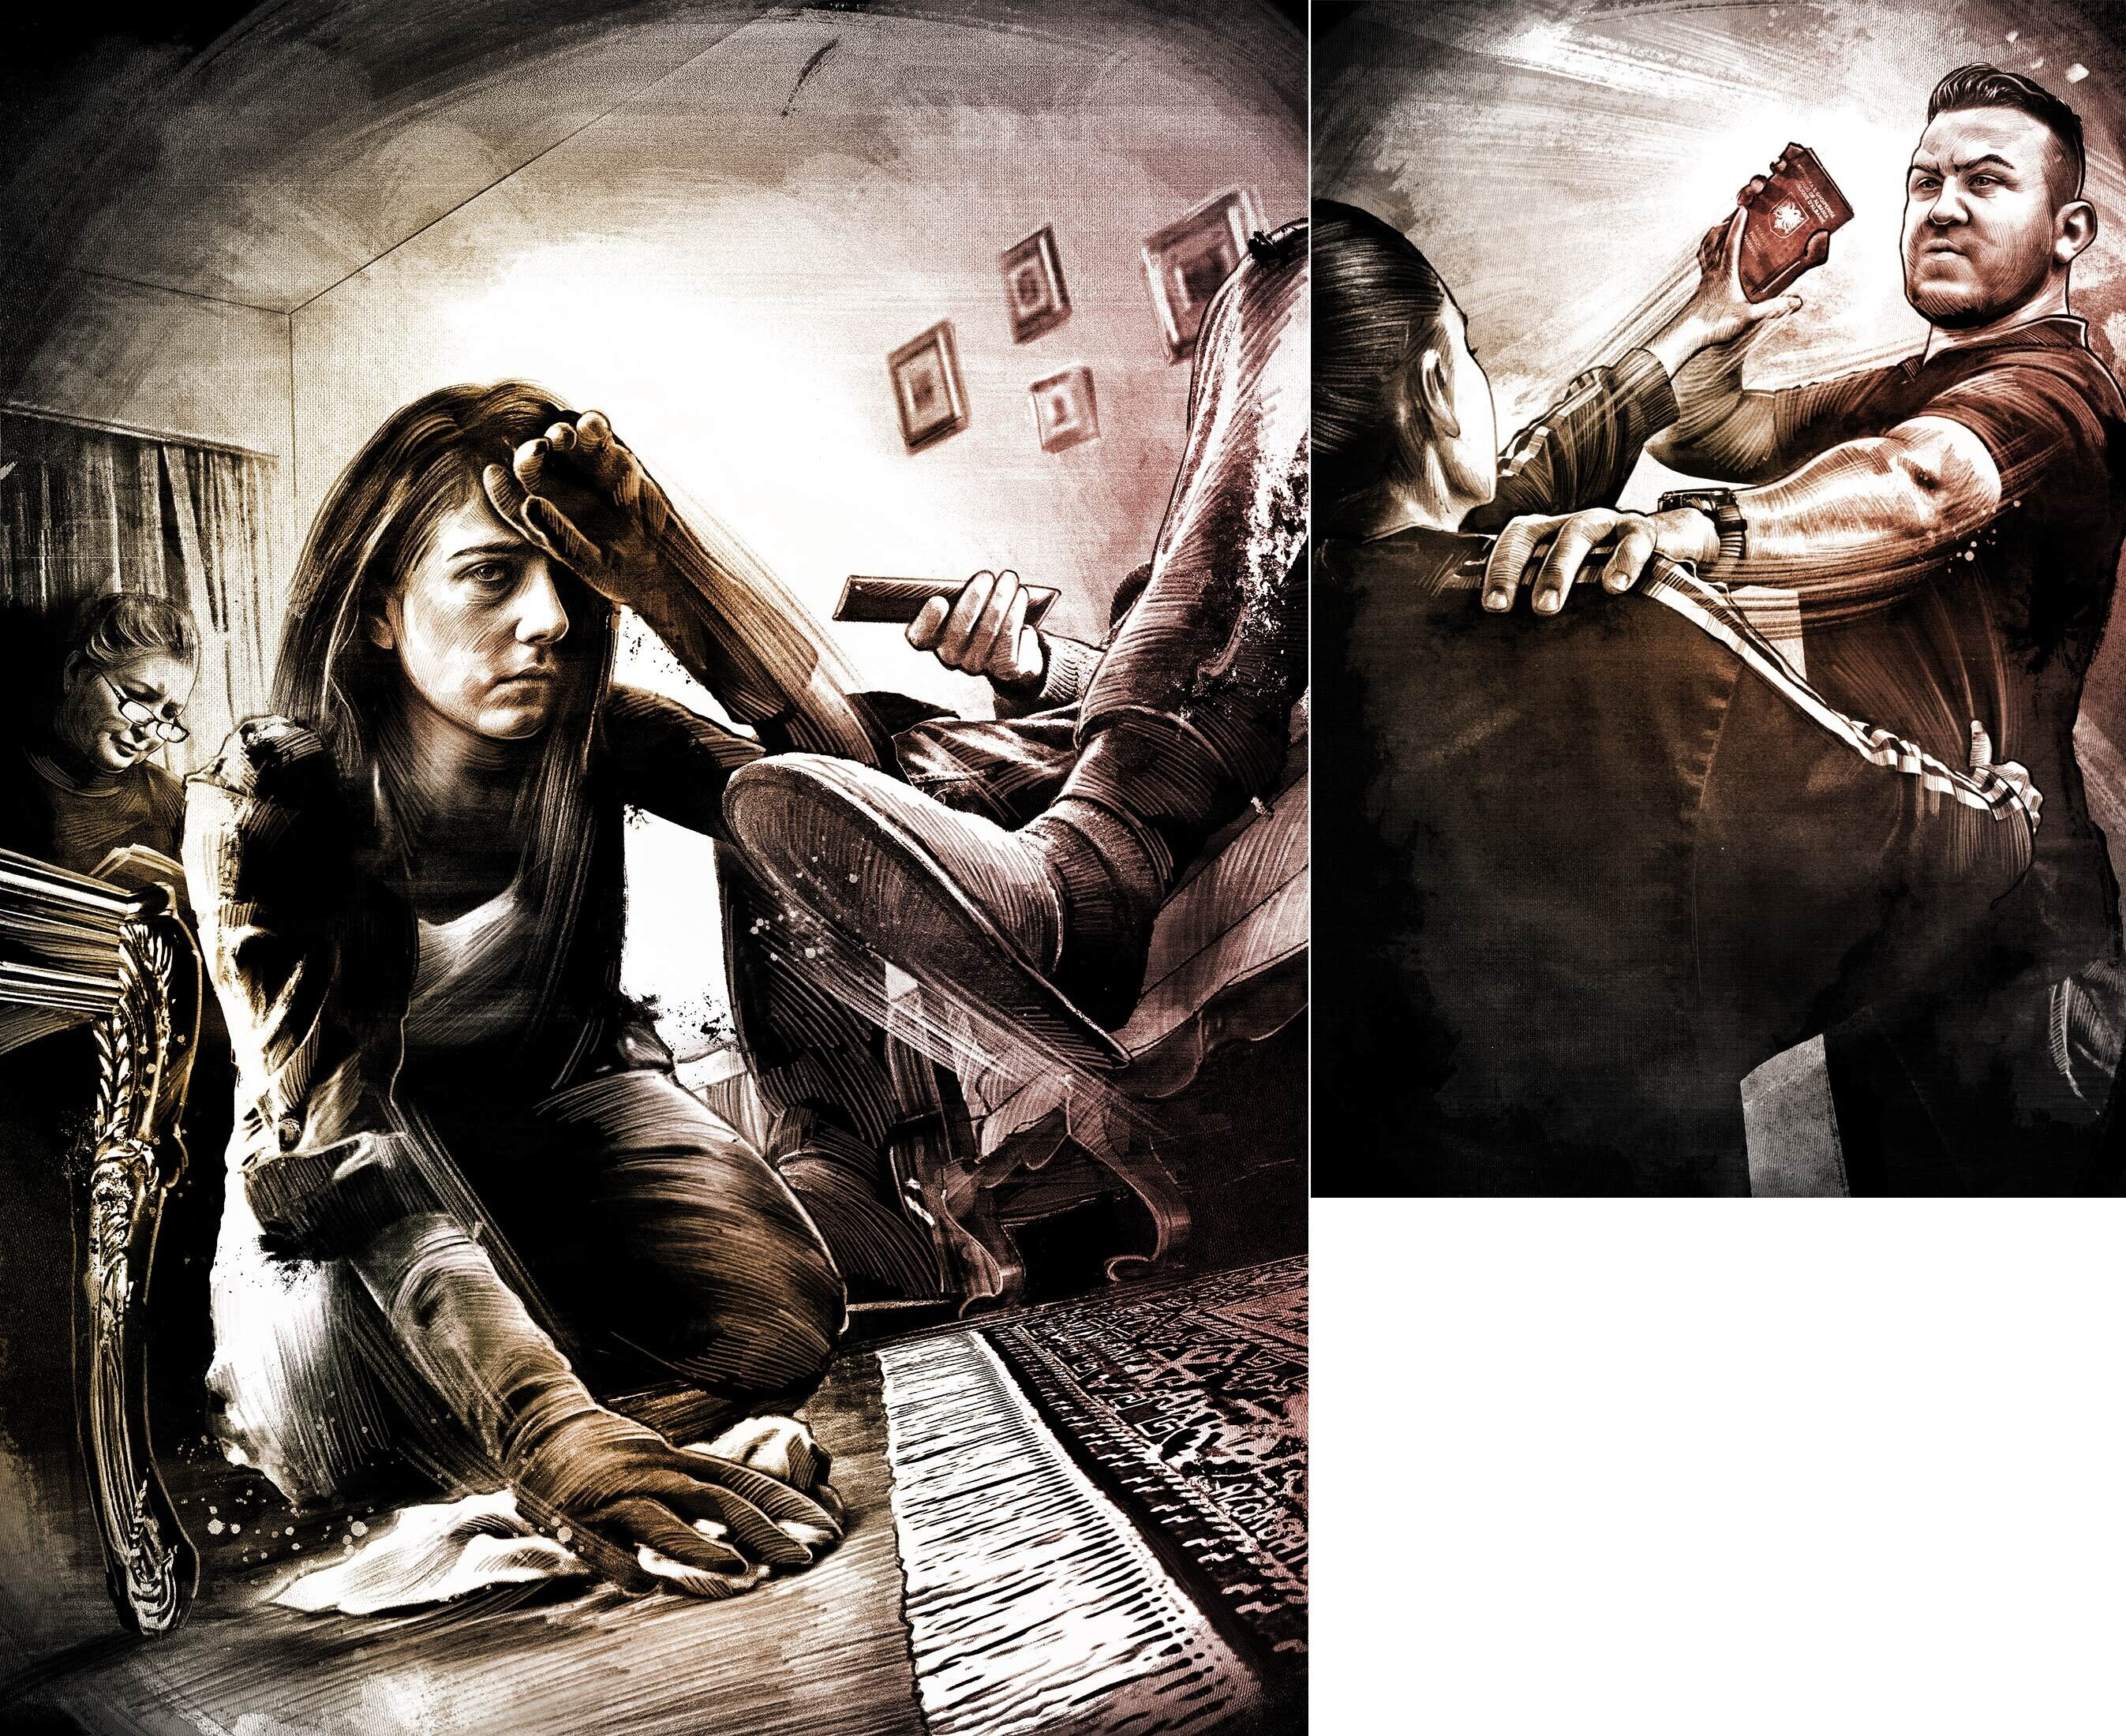 Beobachter Illustration Kosovo Familie streit magazine woman - Kornel Illustration | Kornel Stadler portfolio